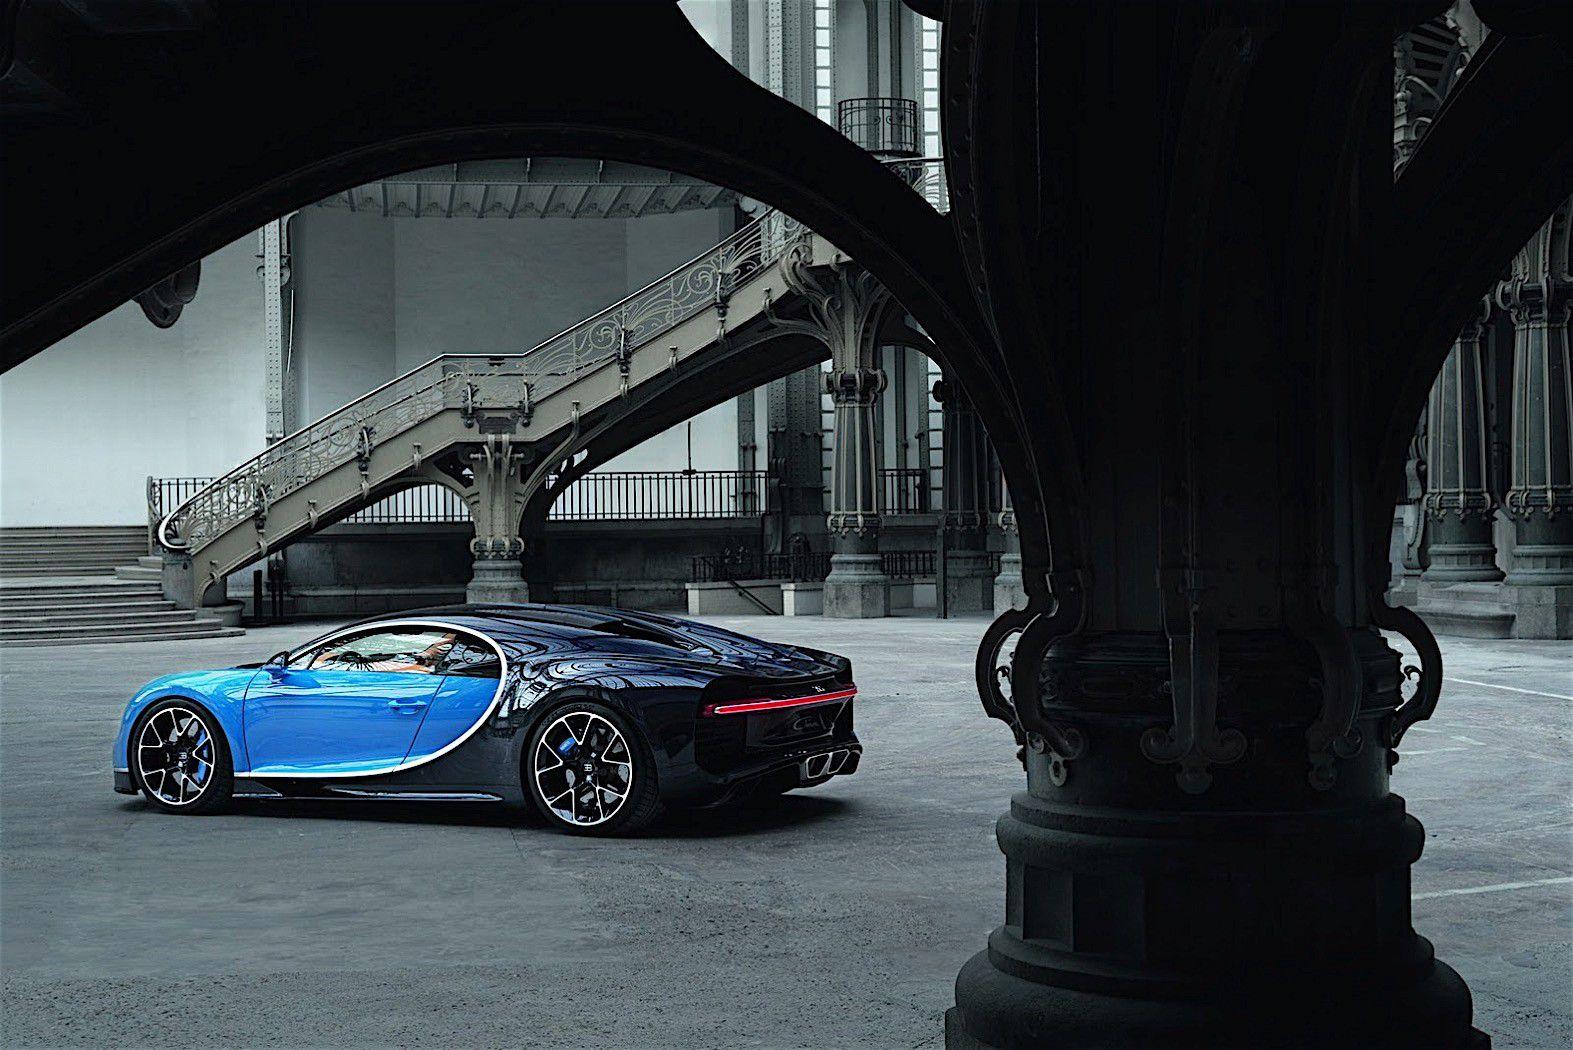 2017-bugatti-chiron-lets-its-quad-turbocharged-w16-loose_51